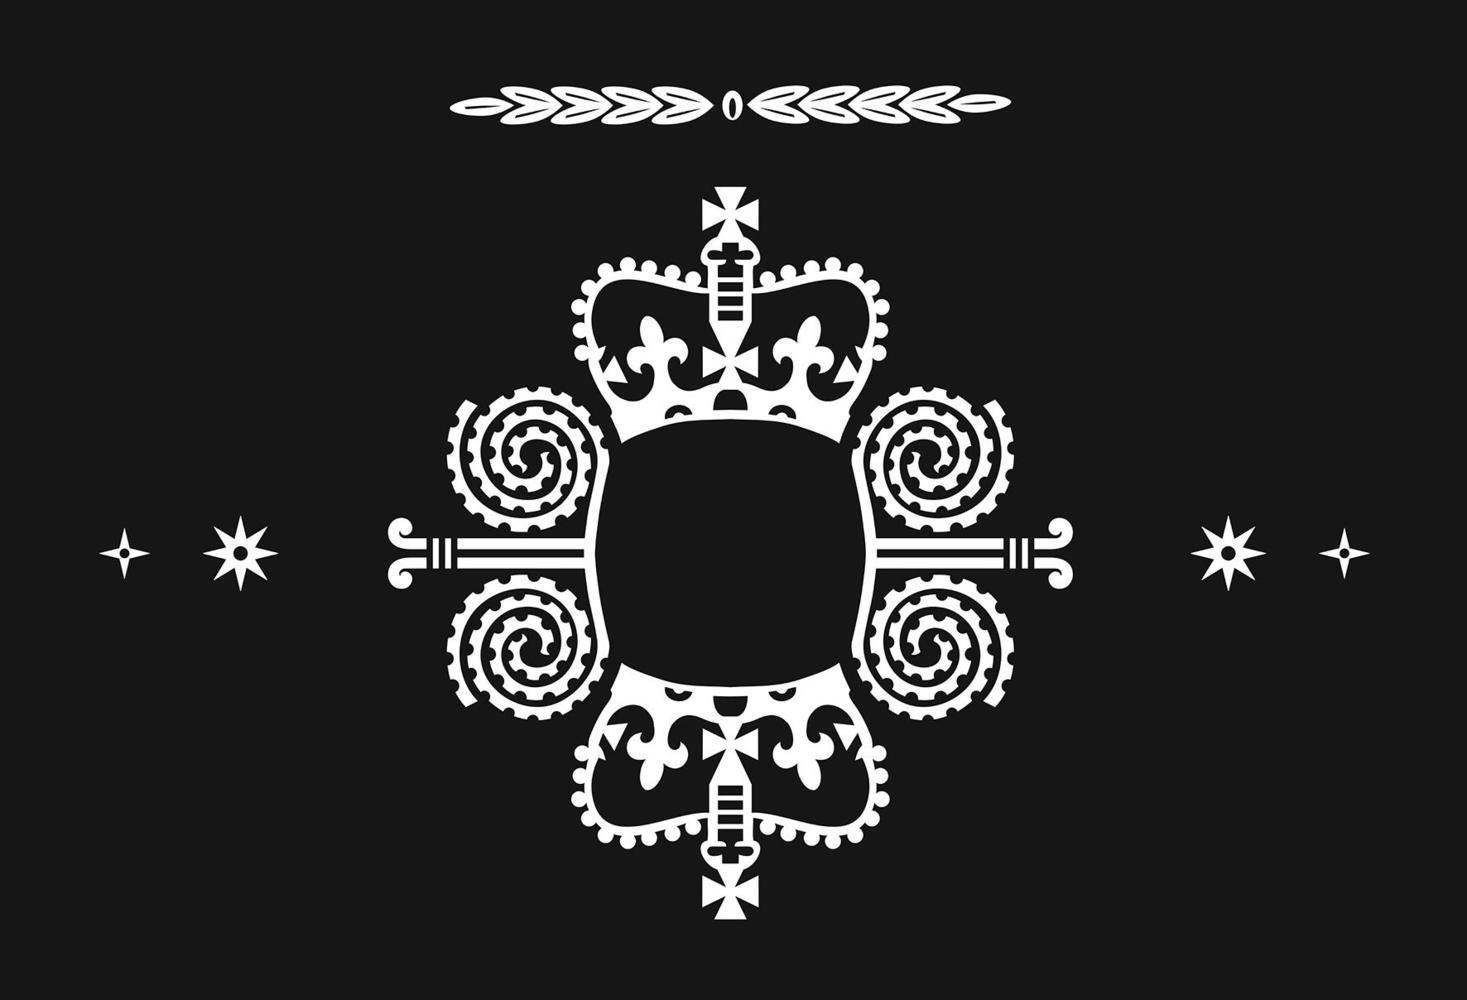 A Māori flag design idea with British Crown and Māori symbols, designed by Desna Whaanga-Schollum